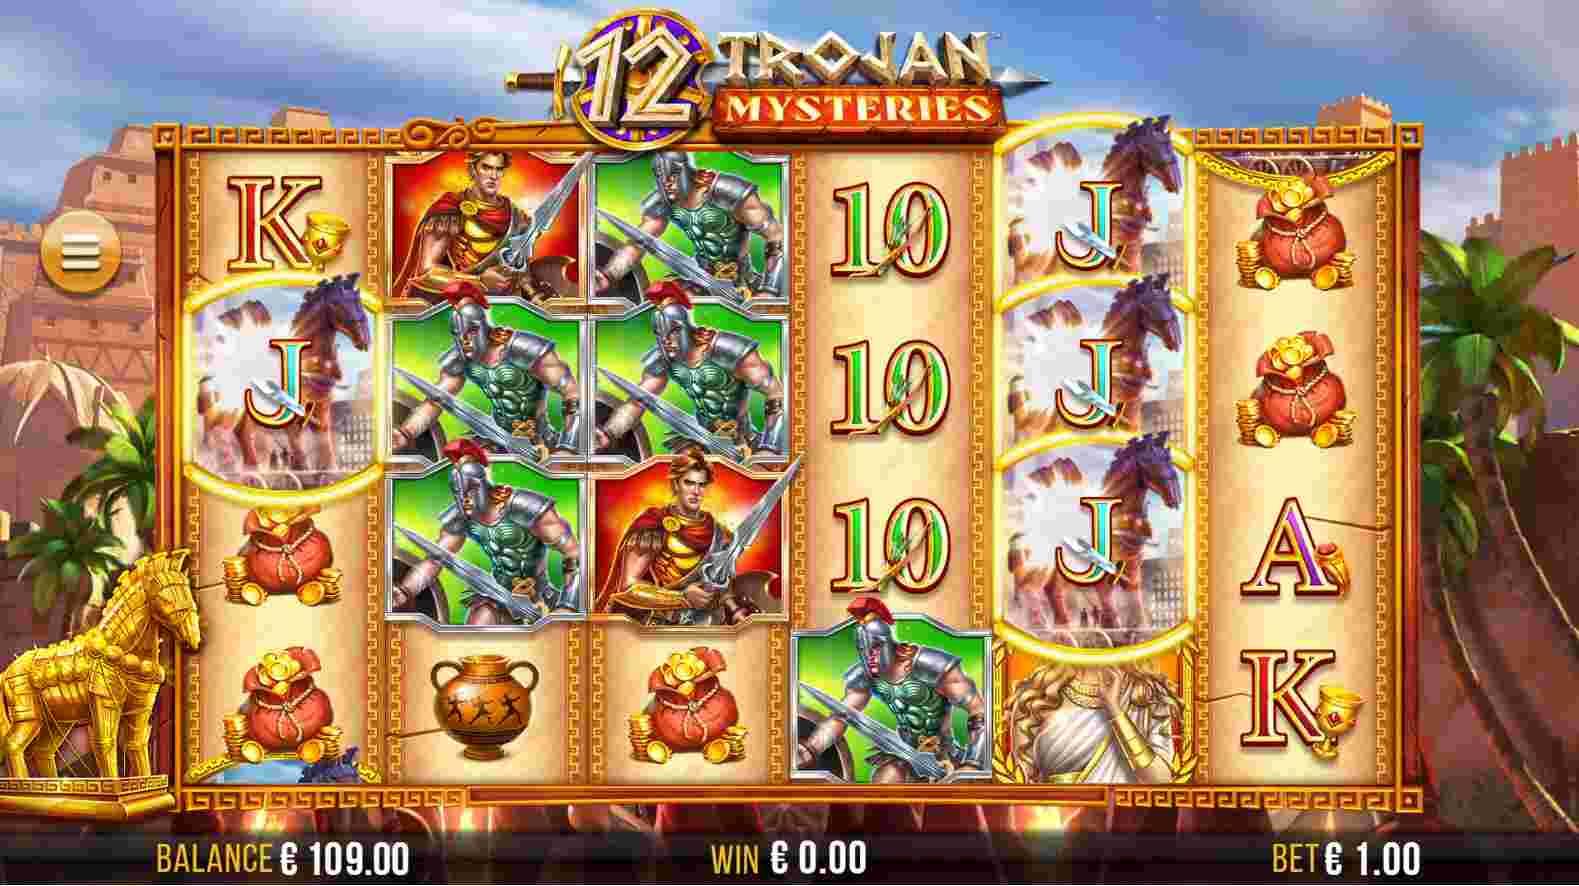 12 Trojan Mysteries Base